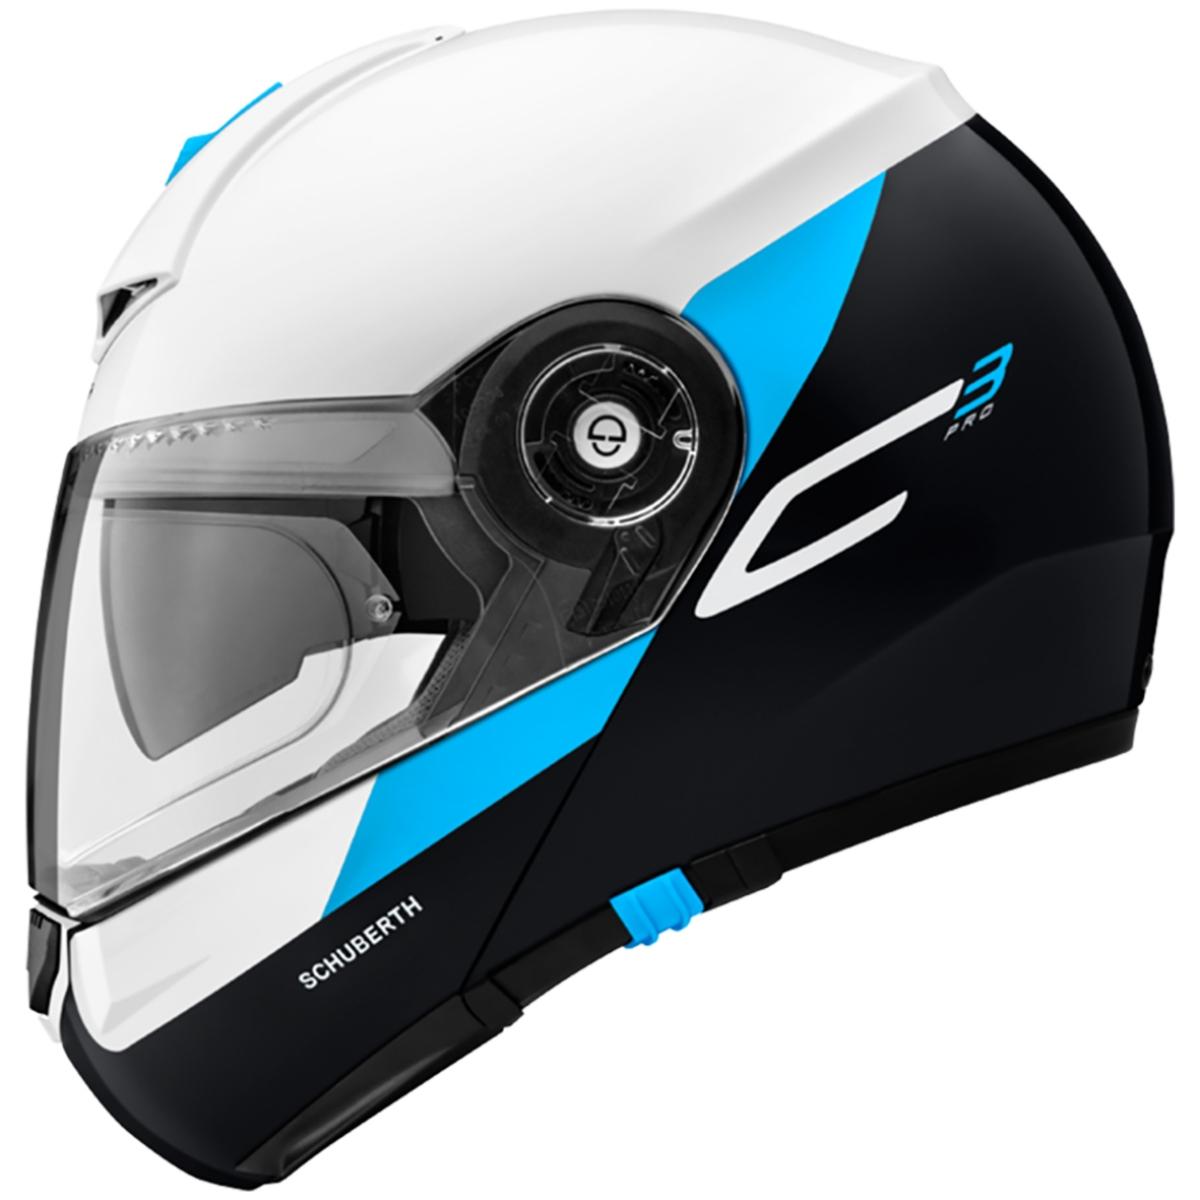 Motorcycle Gear: Schuberth C3 Pro Gravity Blue